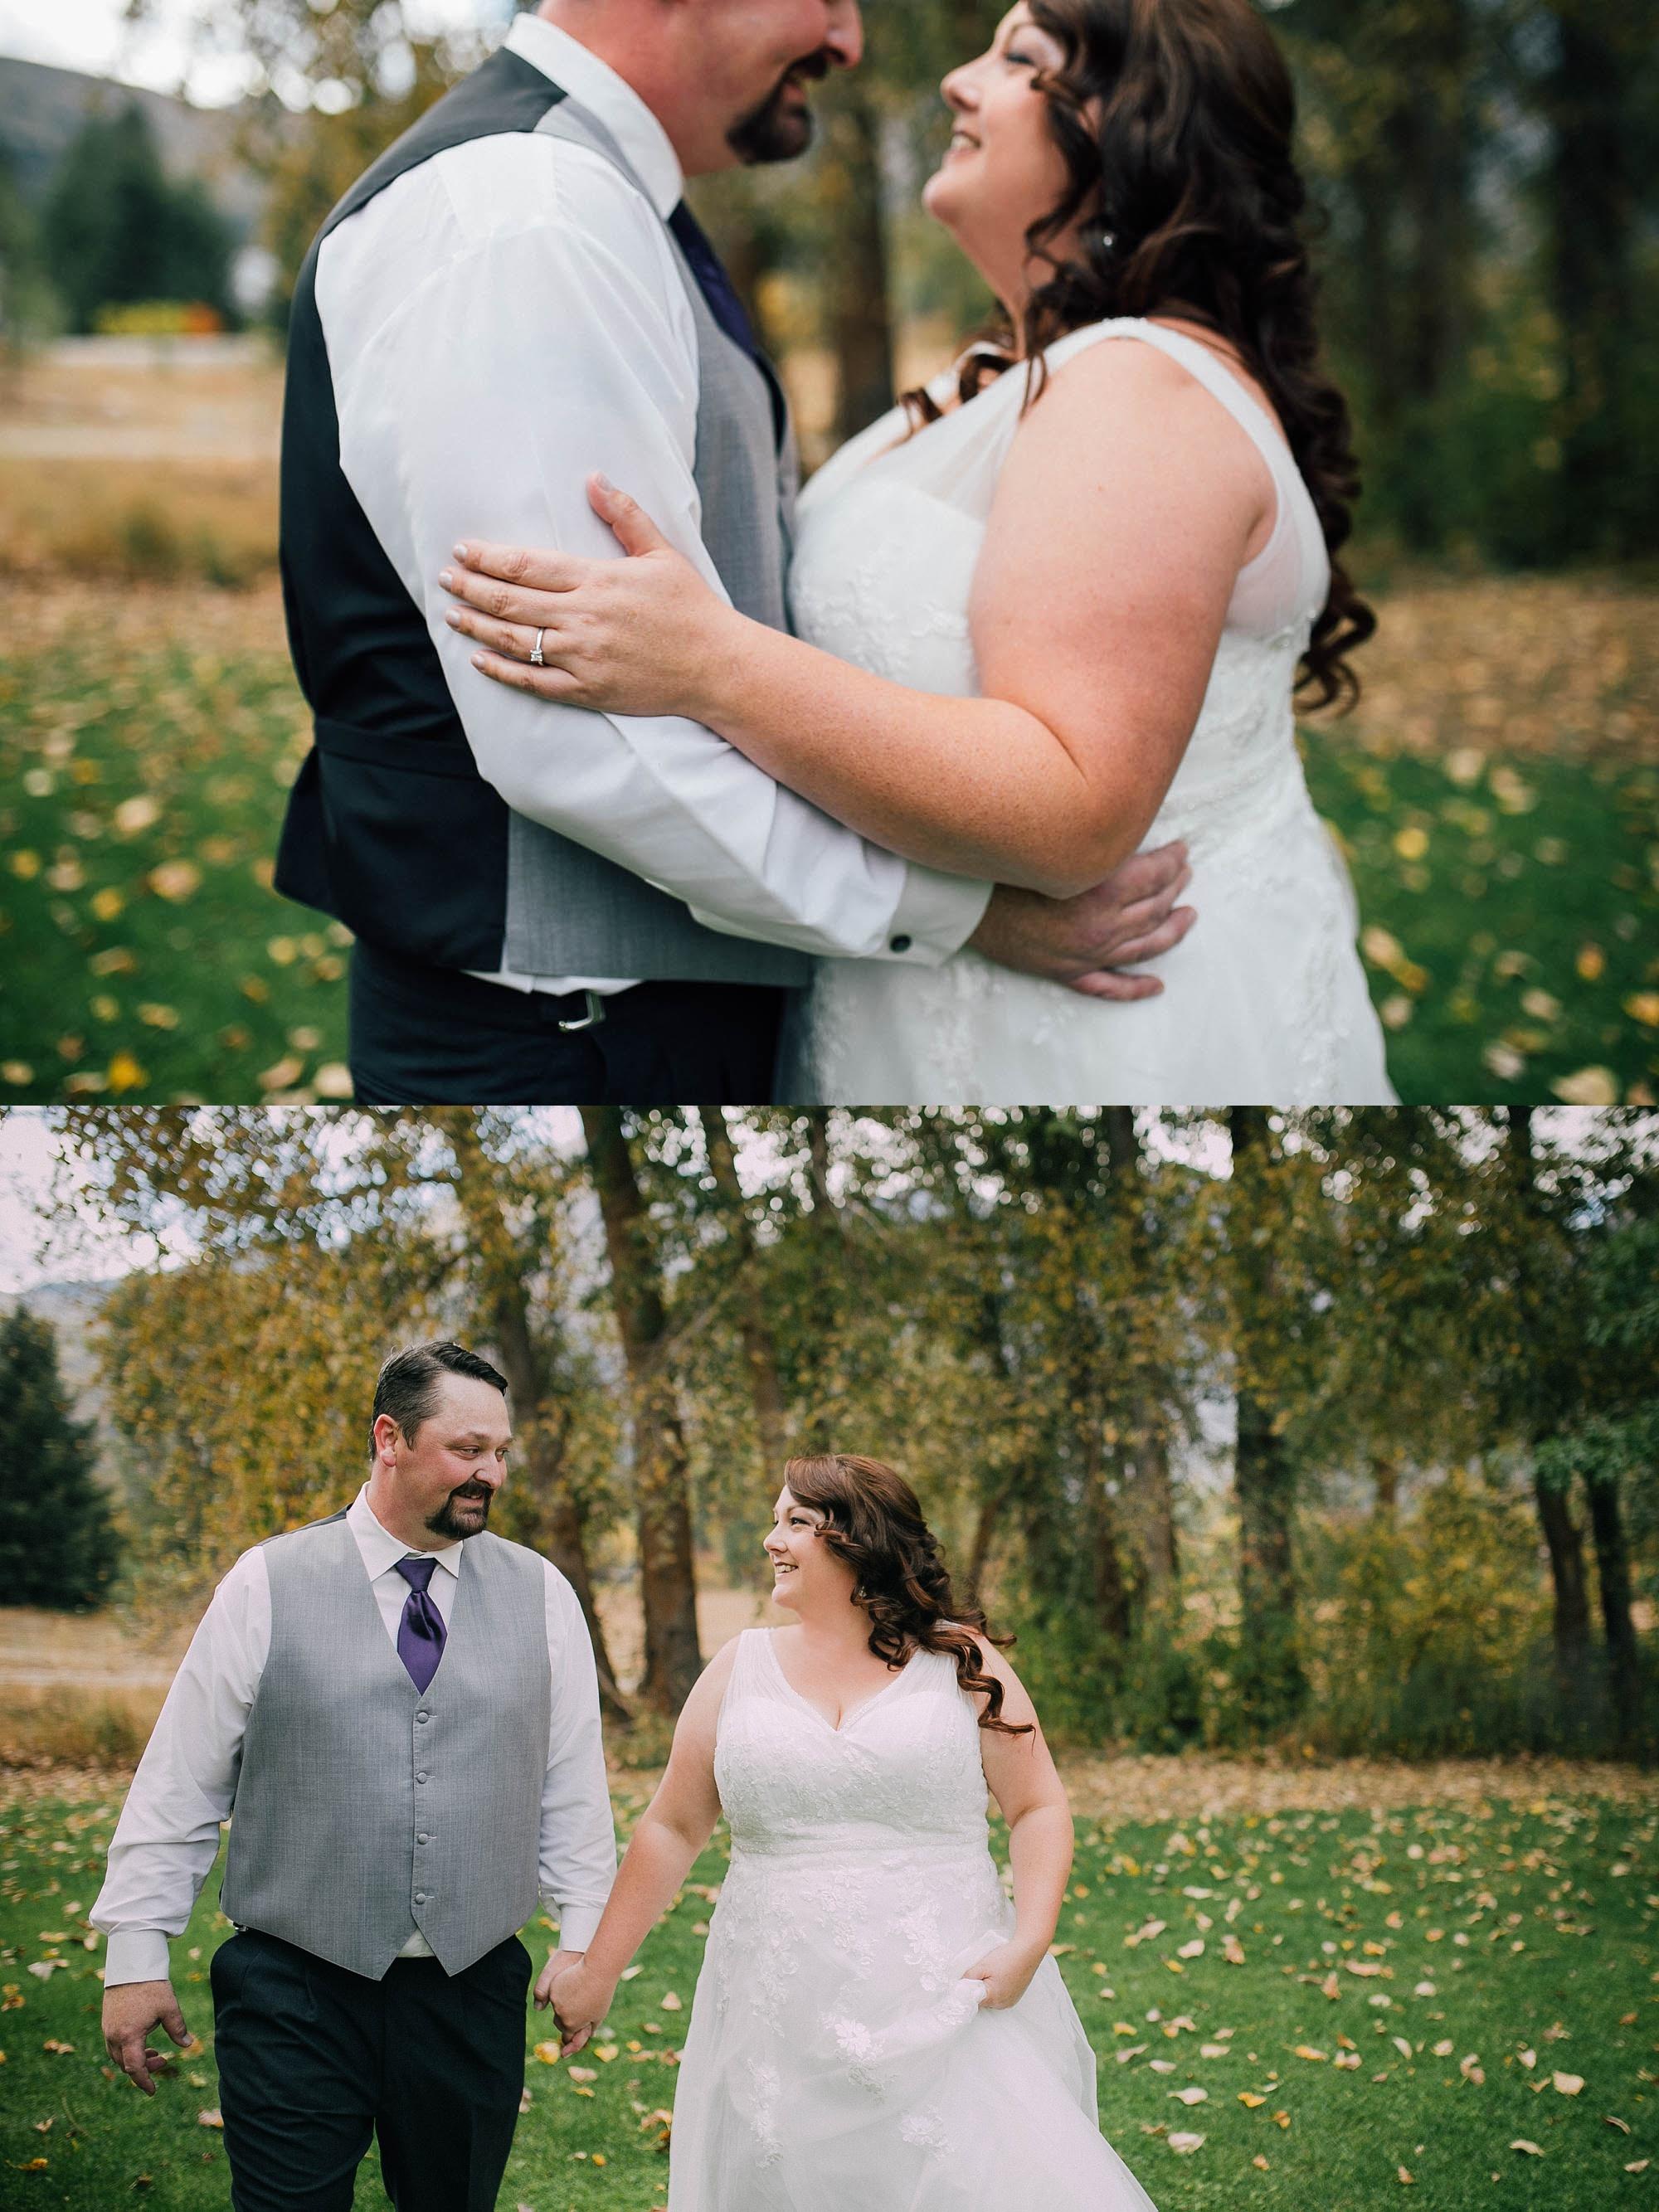 ashley_vos_seattle_ wedding_photographer_0227.jpg